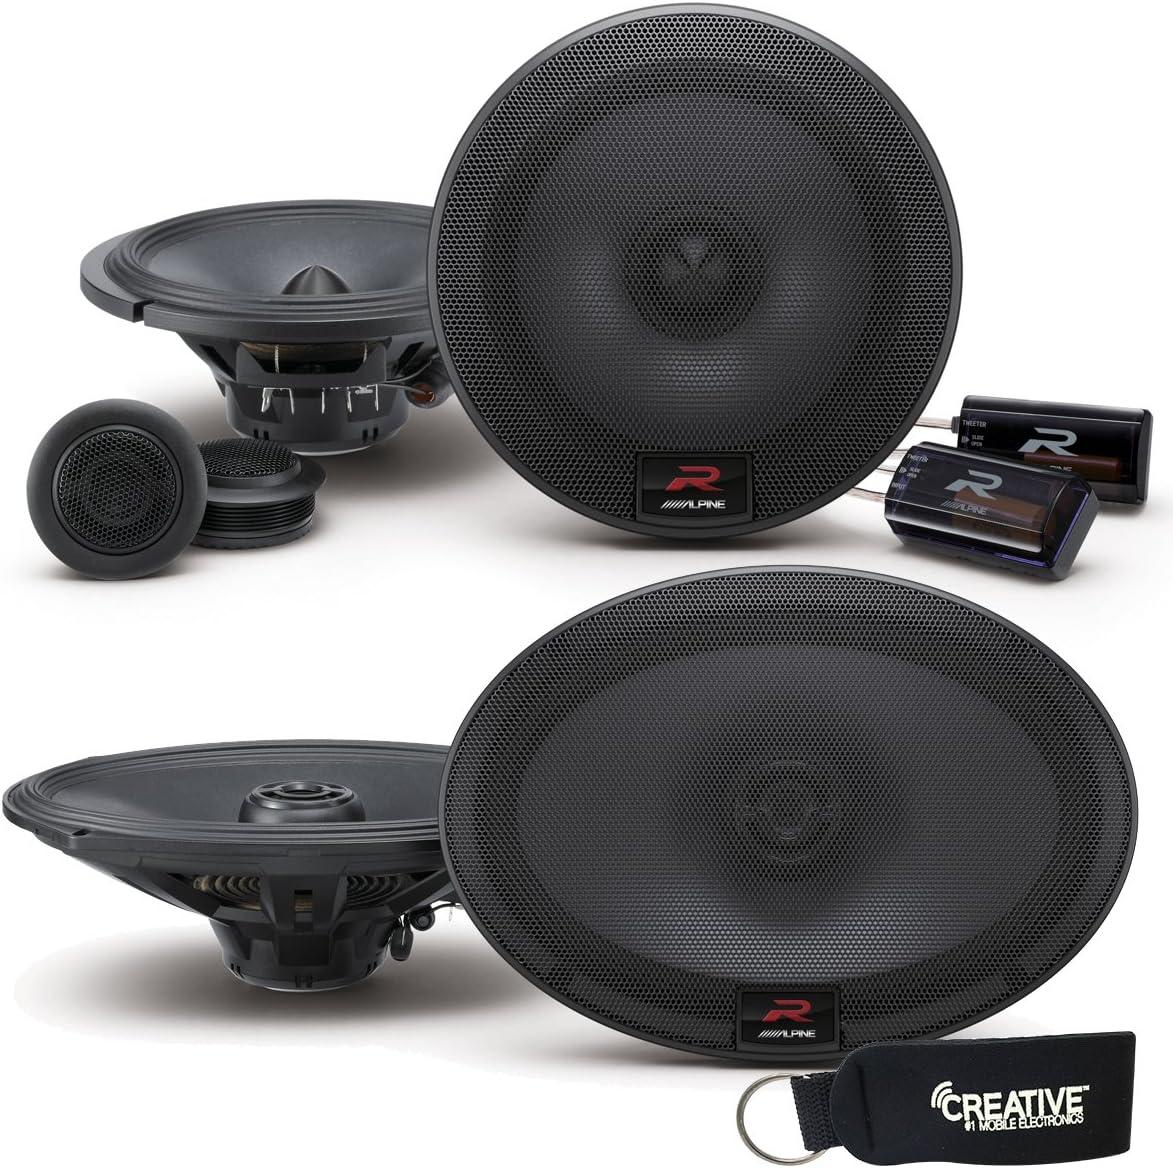 Alpine R-Series Bundle: Best budget 6.5 component speakers